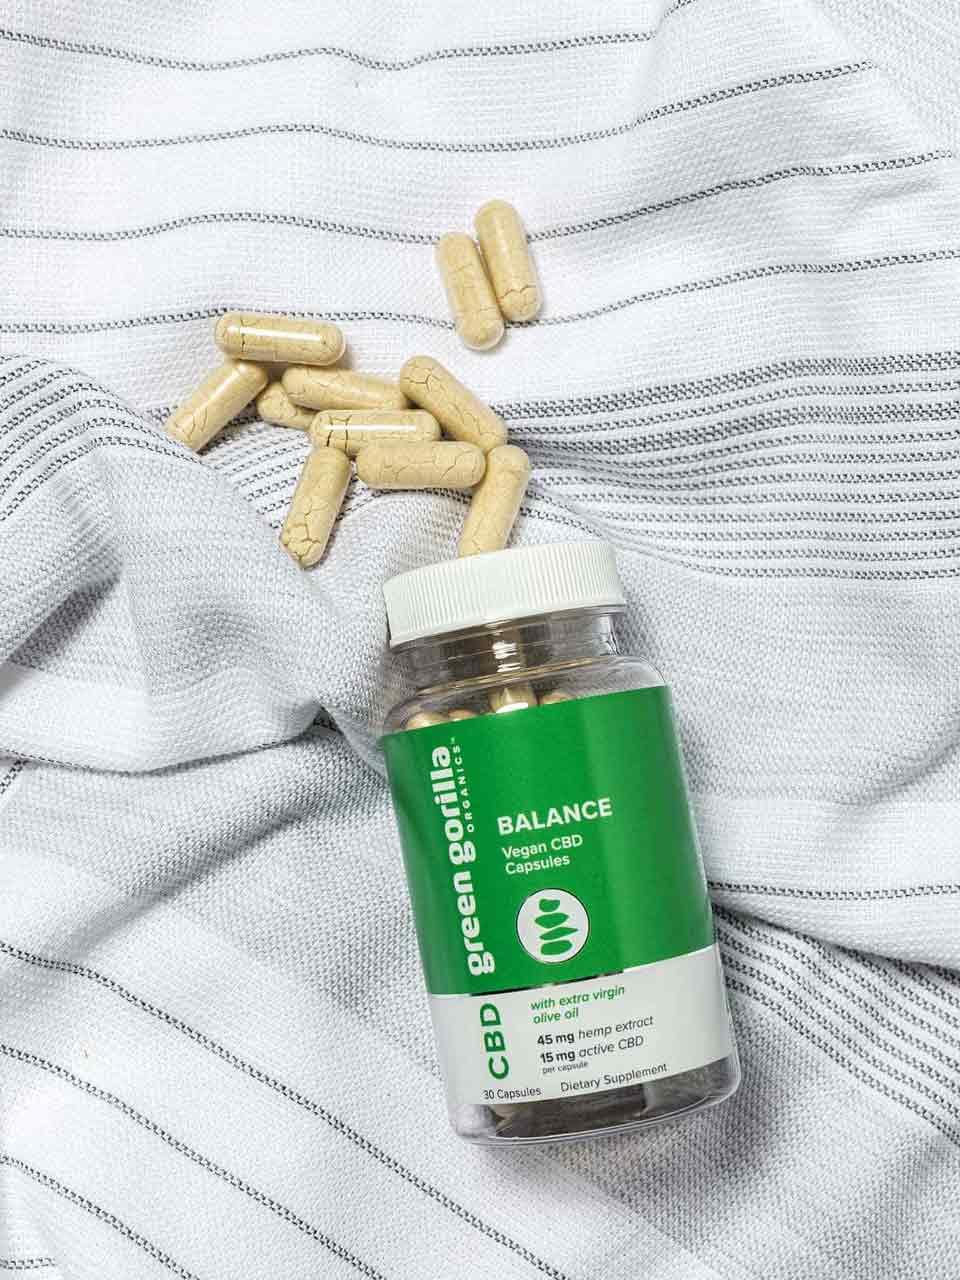 Loose CBD capsules and bottle of Green Gorilla CBD Balance capsules